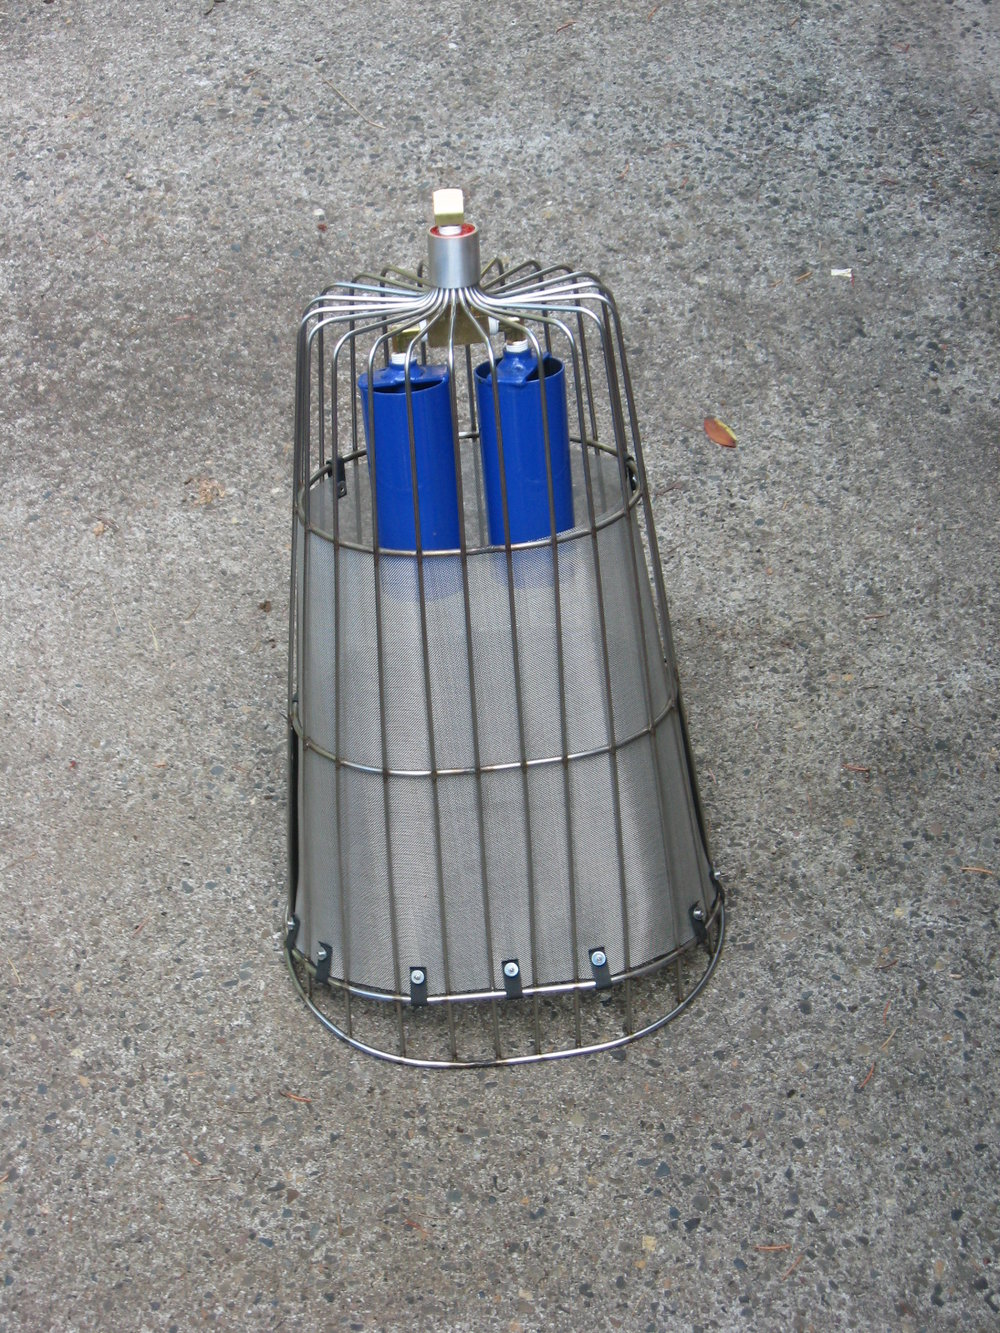 Oval Basket - $219